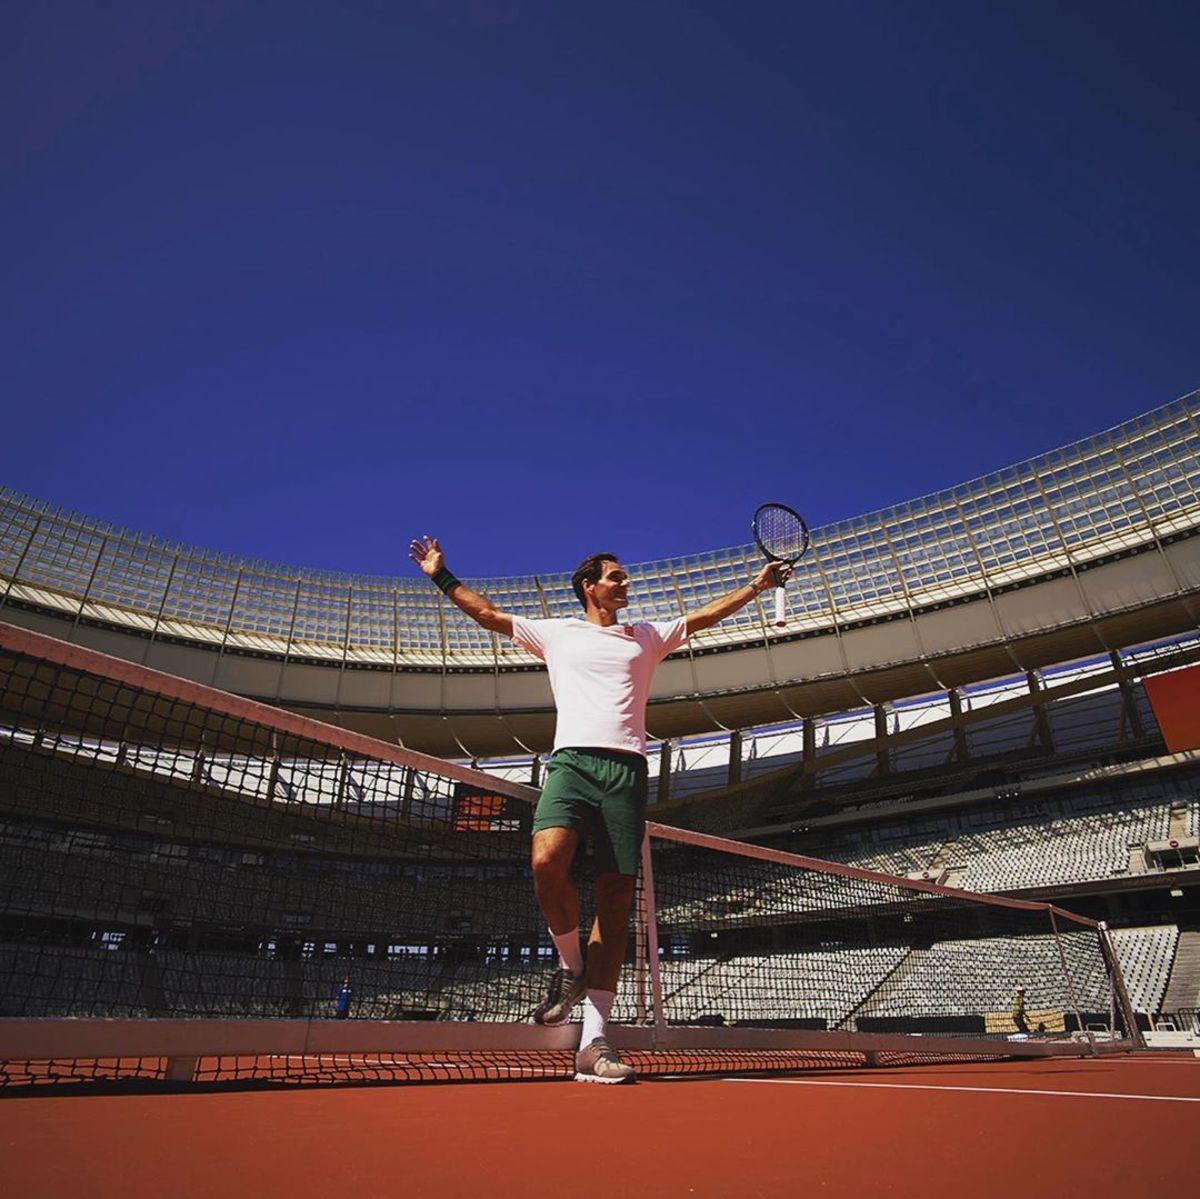 Federer desea retornar a las pistas de tenis en Australia